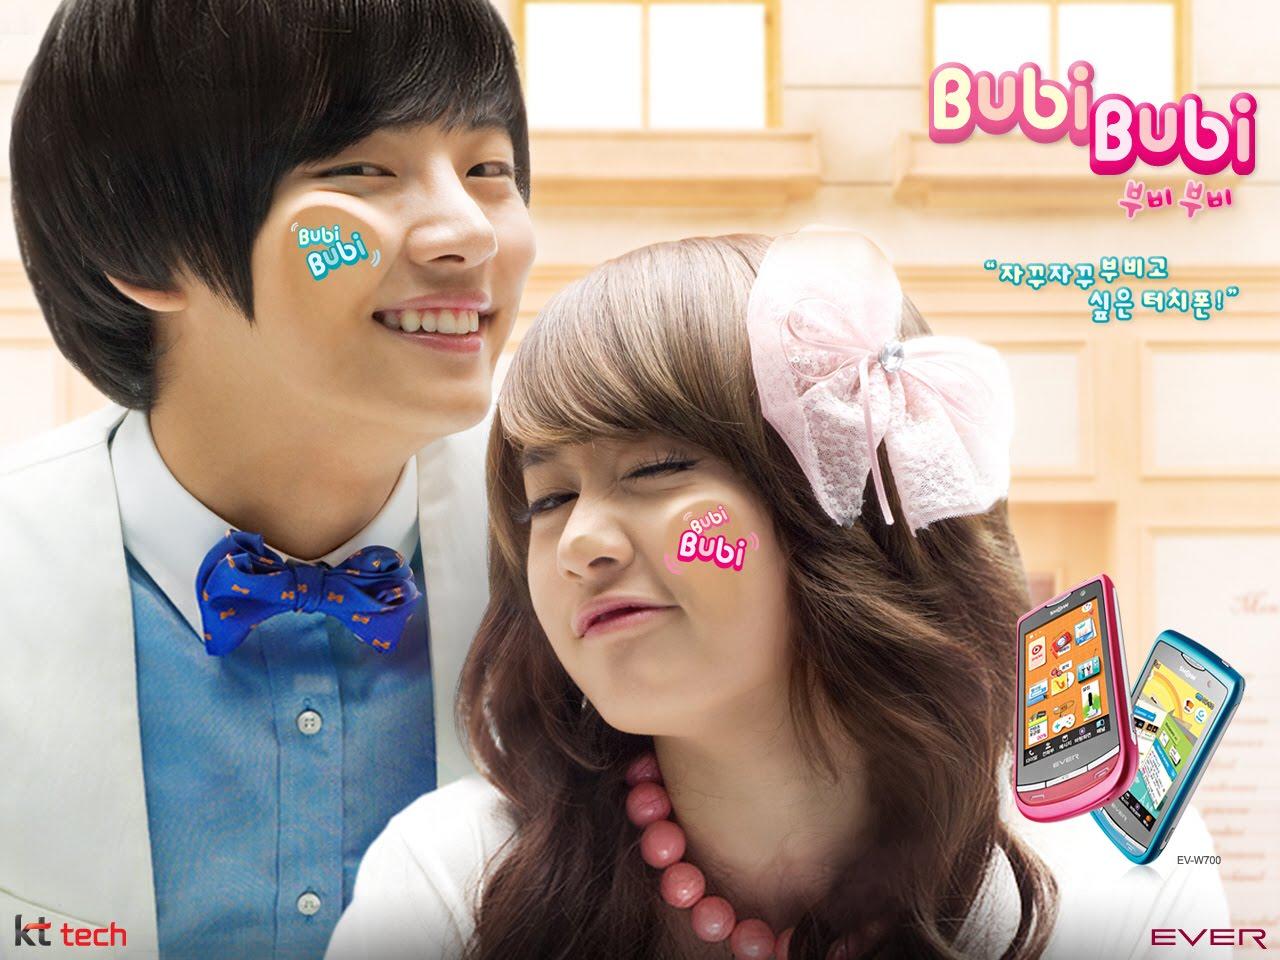 http://4.bp.blogspot.com/_Rxo-dVWeH5A/TJd6B2EzH2I/AAAAAAAAKzo/hC12mvdHXHU/s1600/Yoon_Si_Yun_wallpaper_2.jpg